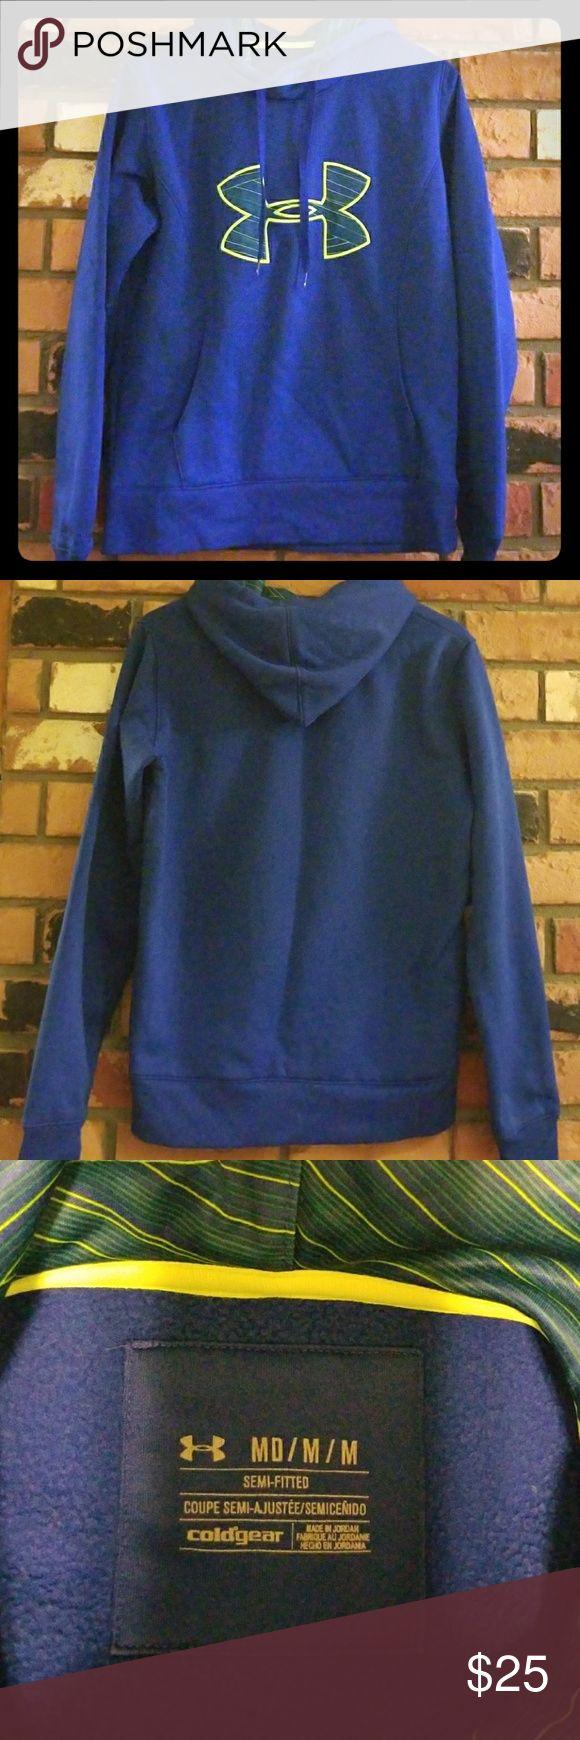 Under Armour blue/neon yellow hoodie Bright blue Under Armour hoodie with neon yellow details Under Armour Tops Sweatshirts & Hoodies